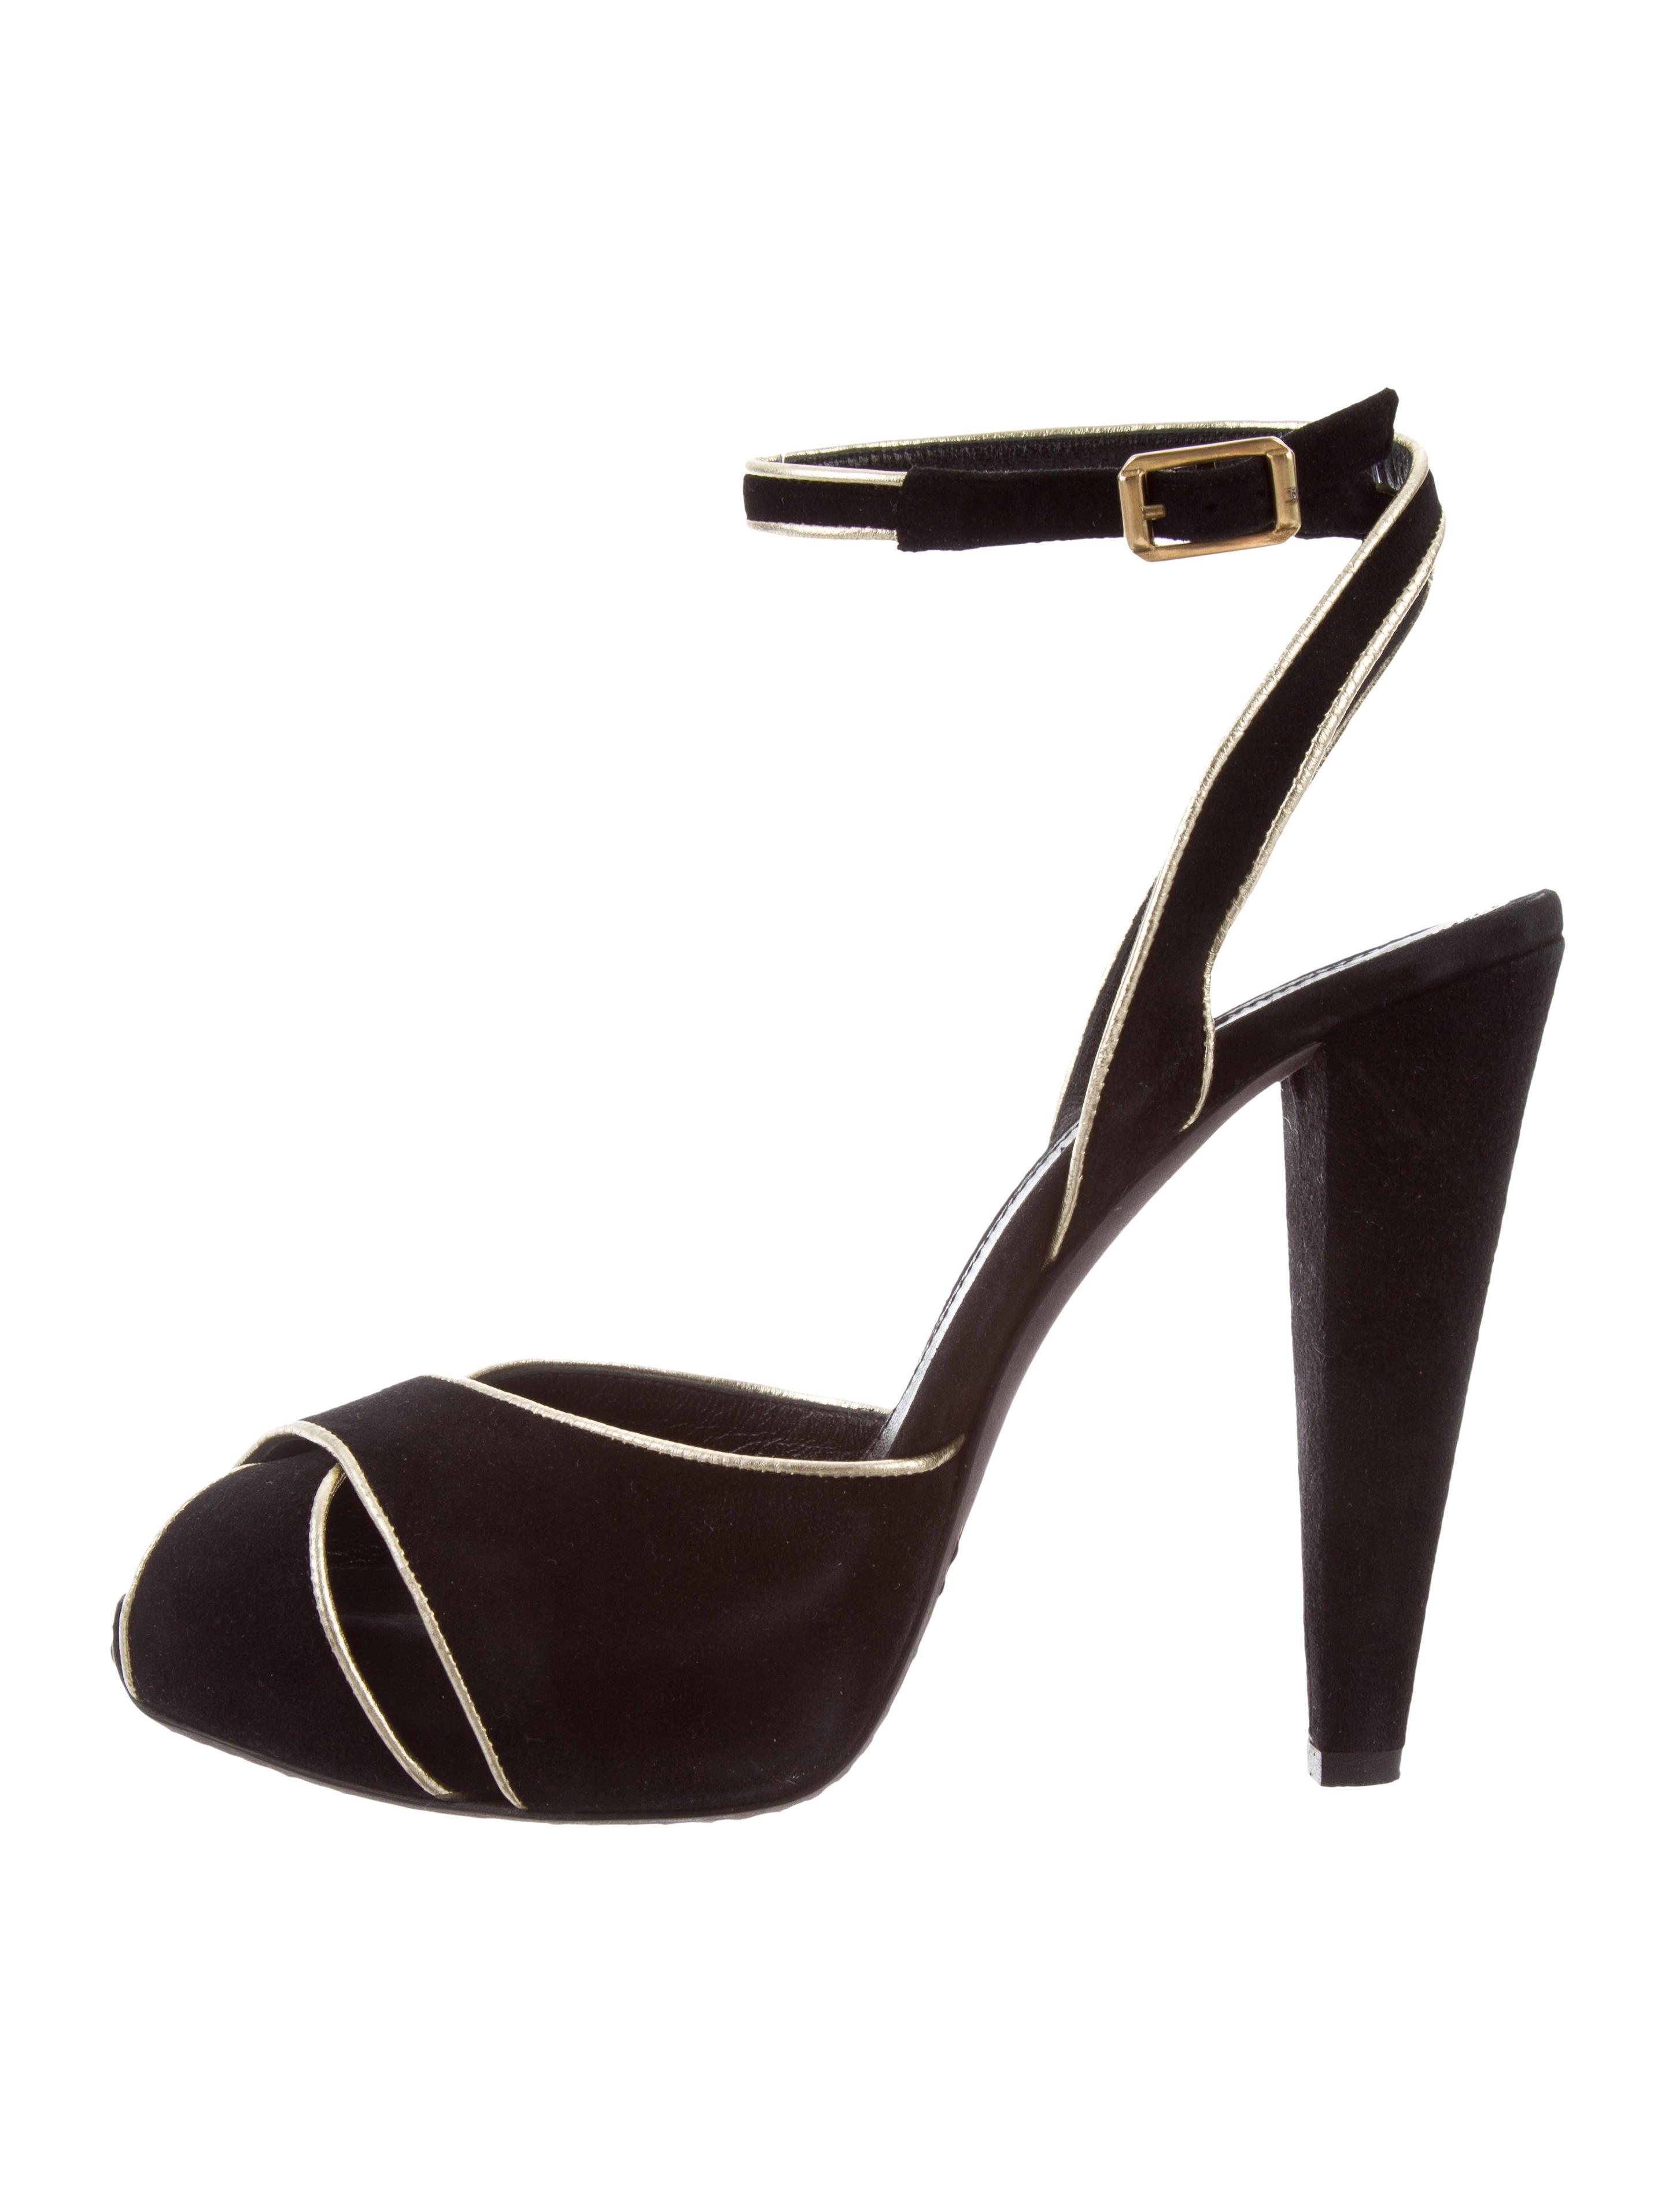 Giambattista Valli Suede Crossover Sandals cheap geniue stockist cheap sale nicekicks heADOUDGD